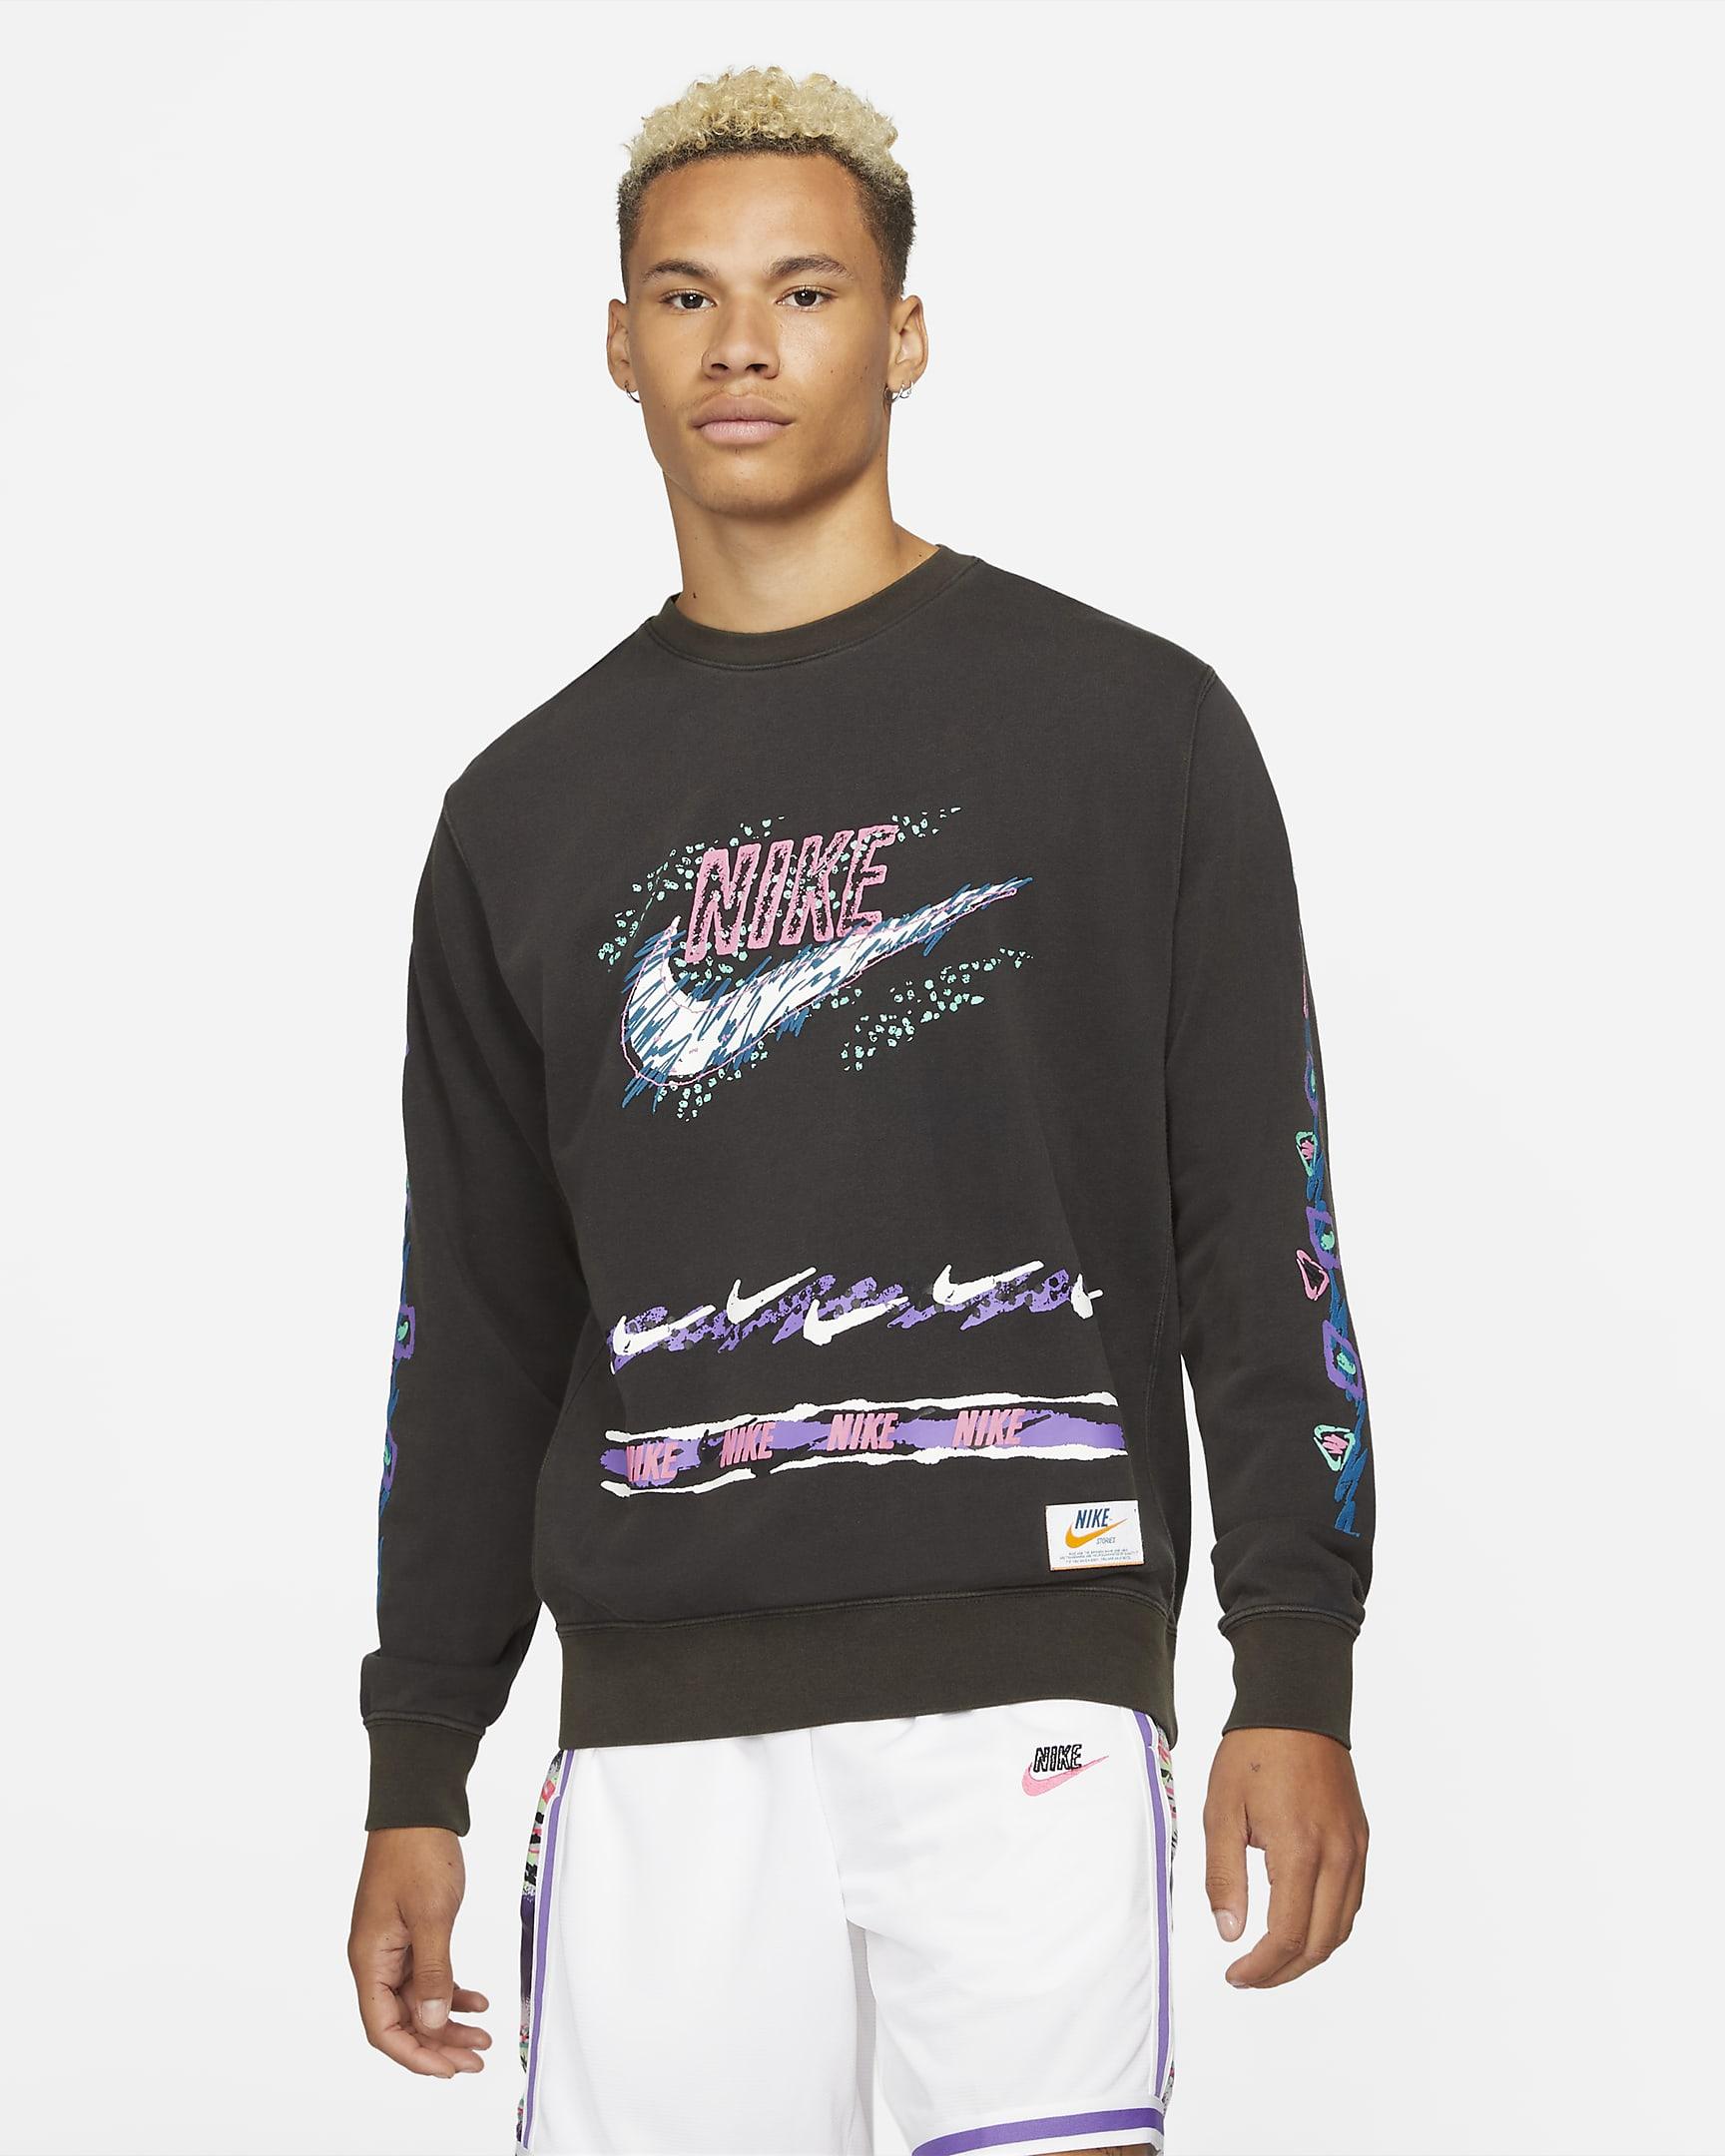 nike-sportswear-club-stories-mens-sweatshirt-V5SkK5.png